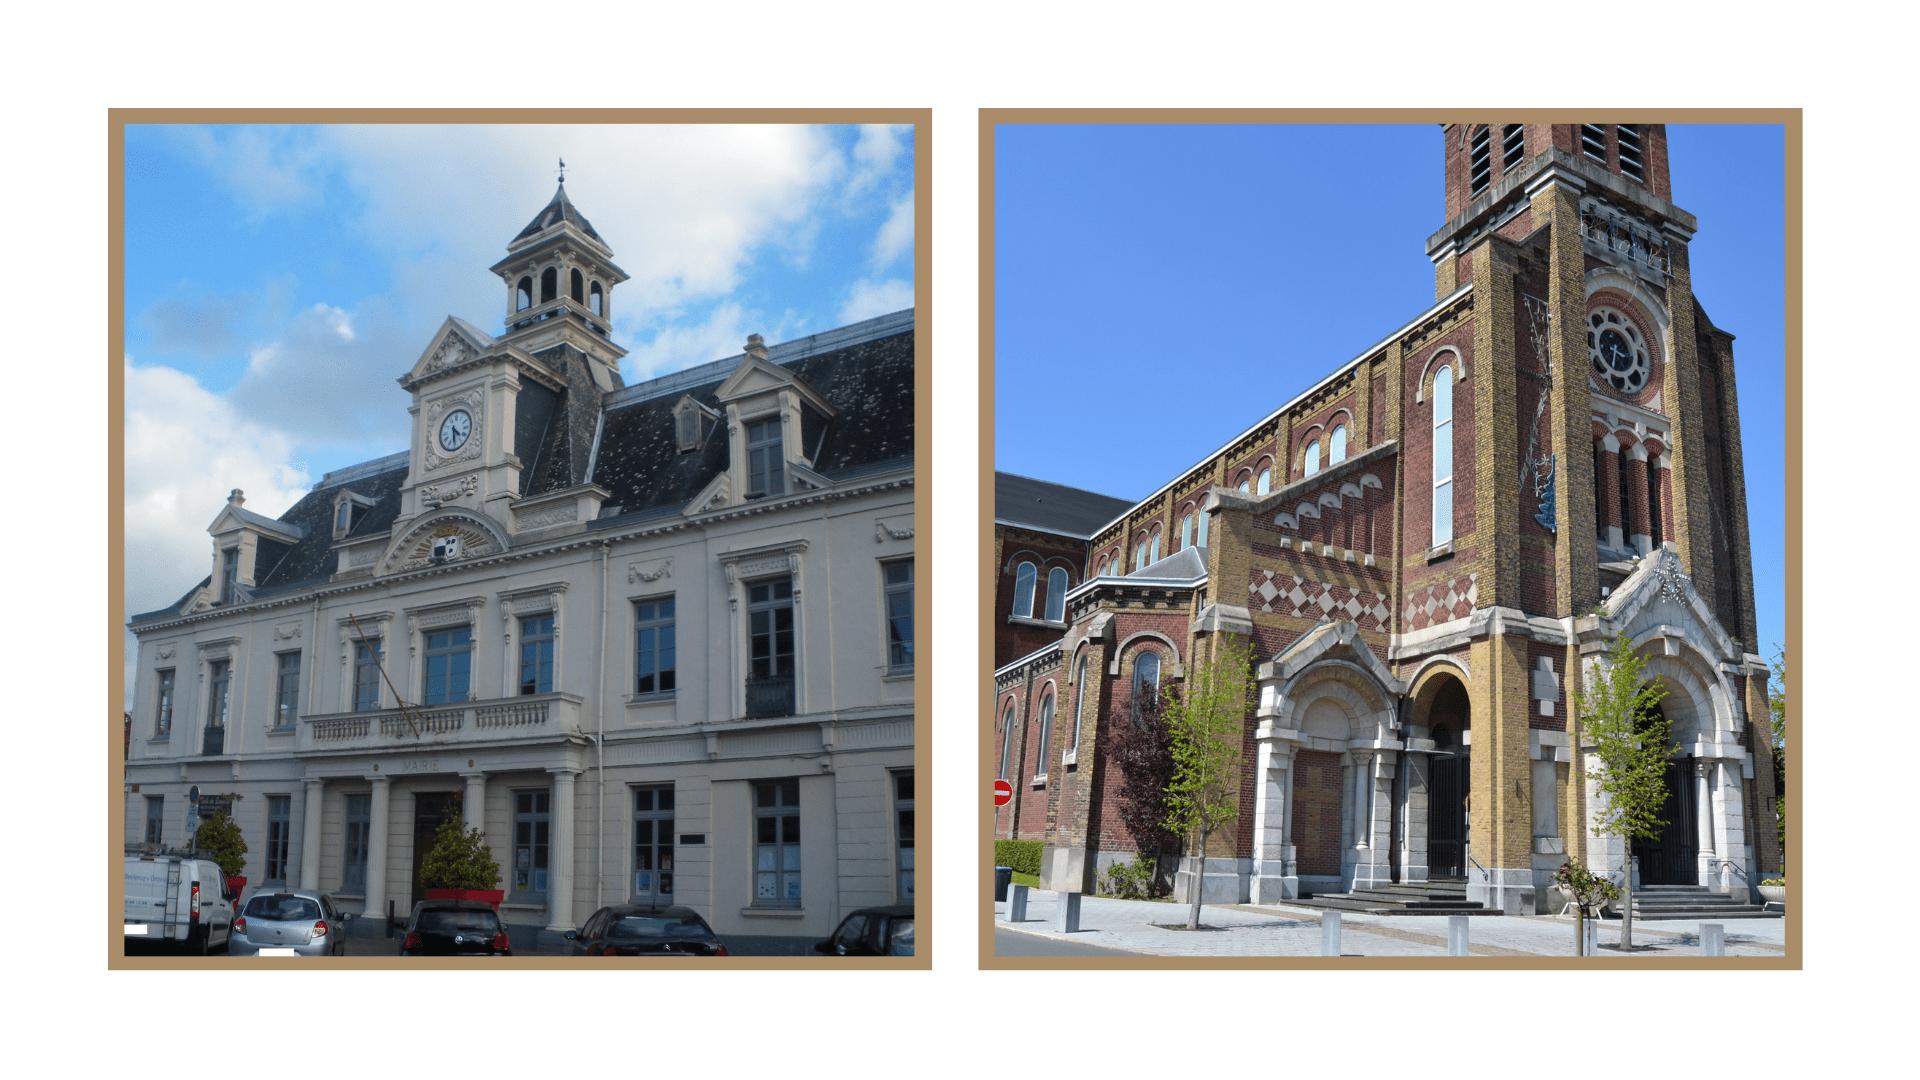 investissement-agglomération-lilloise-2021-lannoy